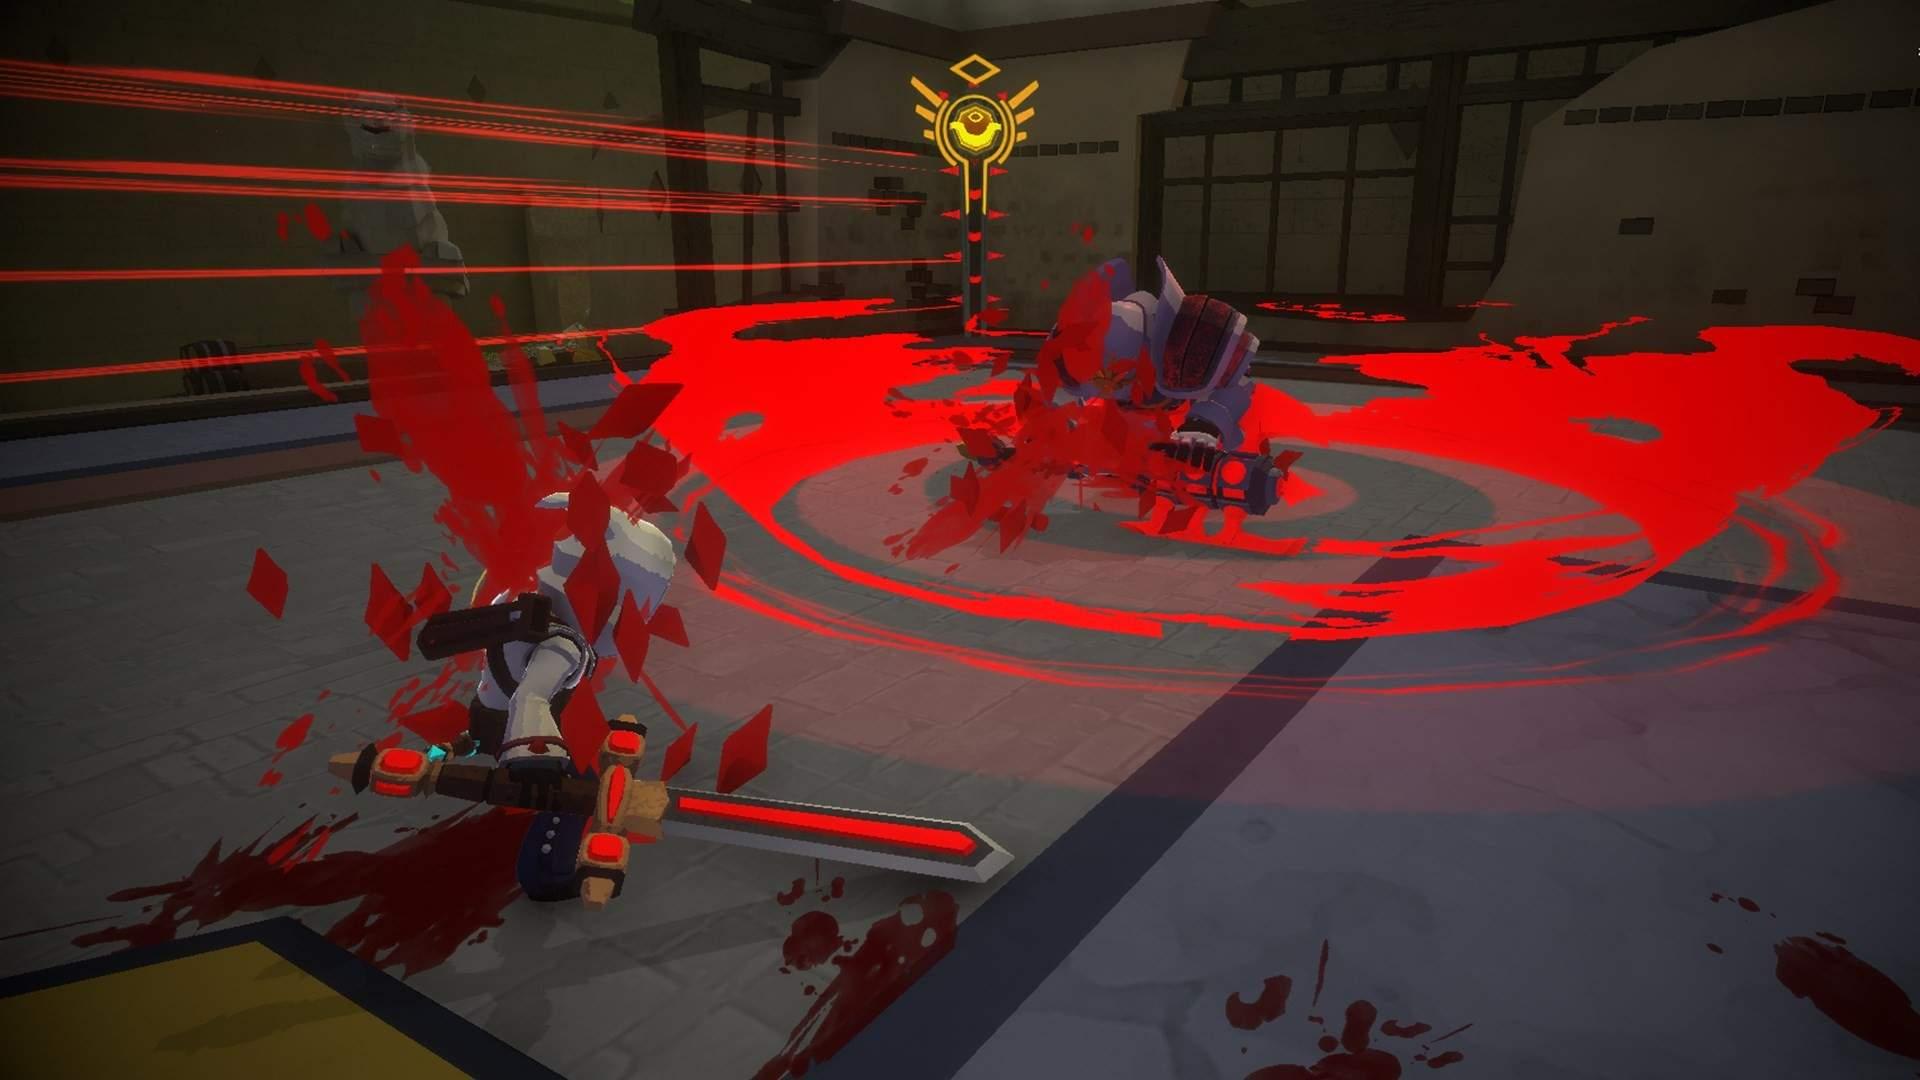 Hindsight 20/20 - Wrath of the Raakshasa - 9 settembre - Ottimizzato per Xbox Series X S ● Smart Delivery